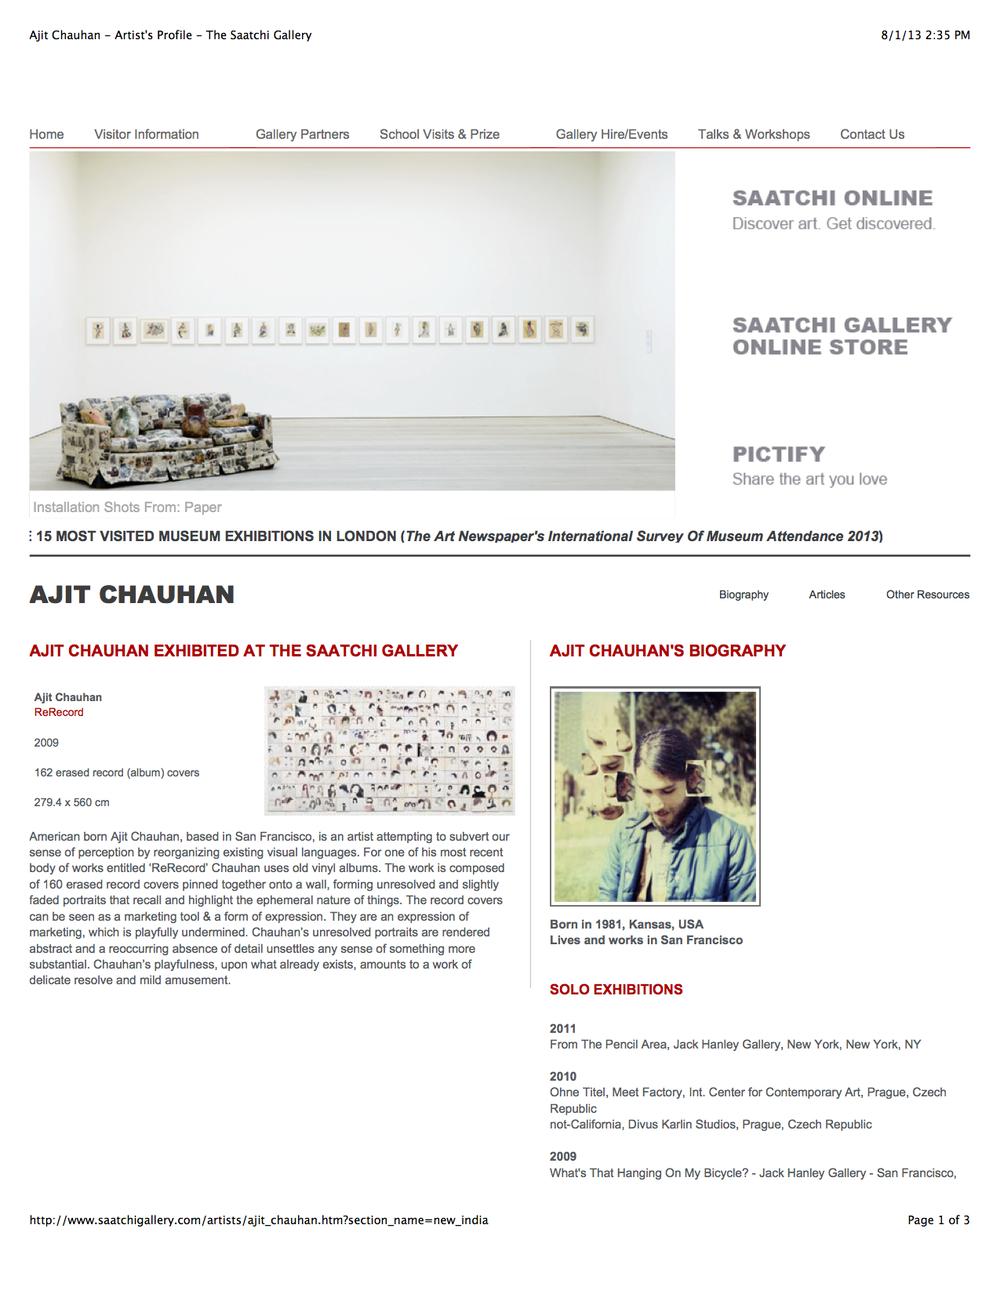 Ajit Chauhan - Artist's Profile - The Saatchi Gallery.jpg